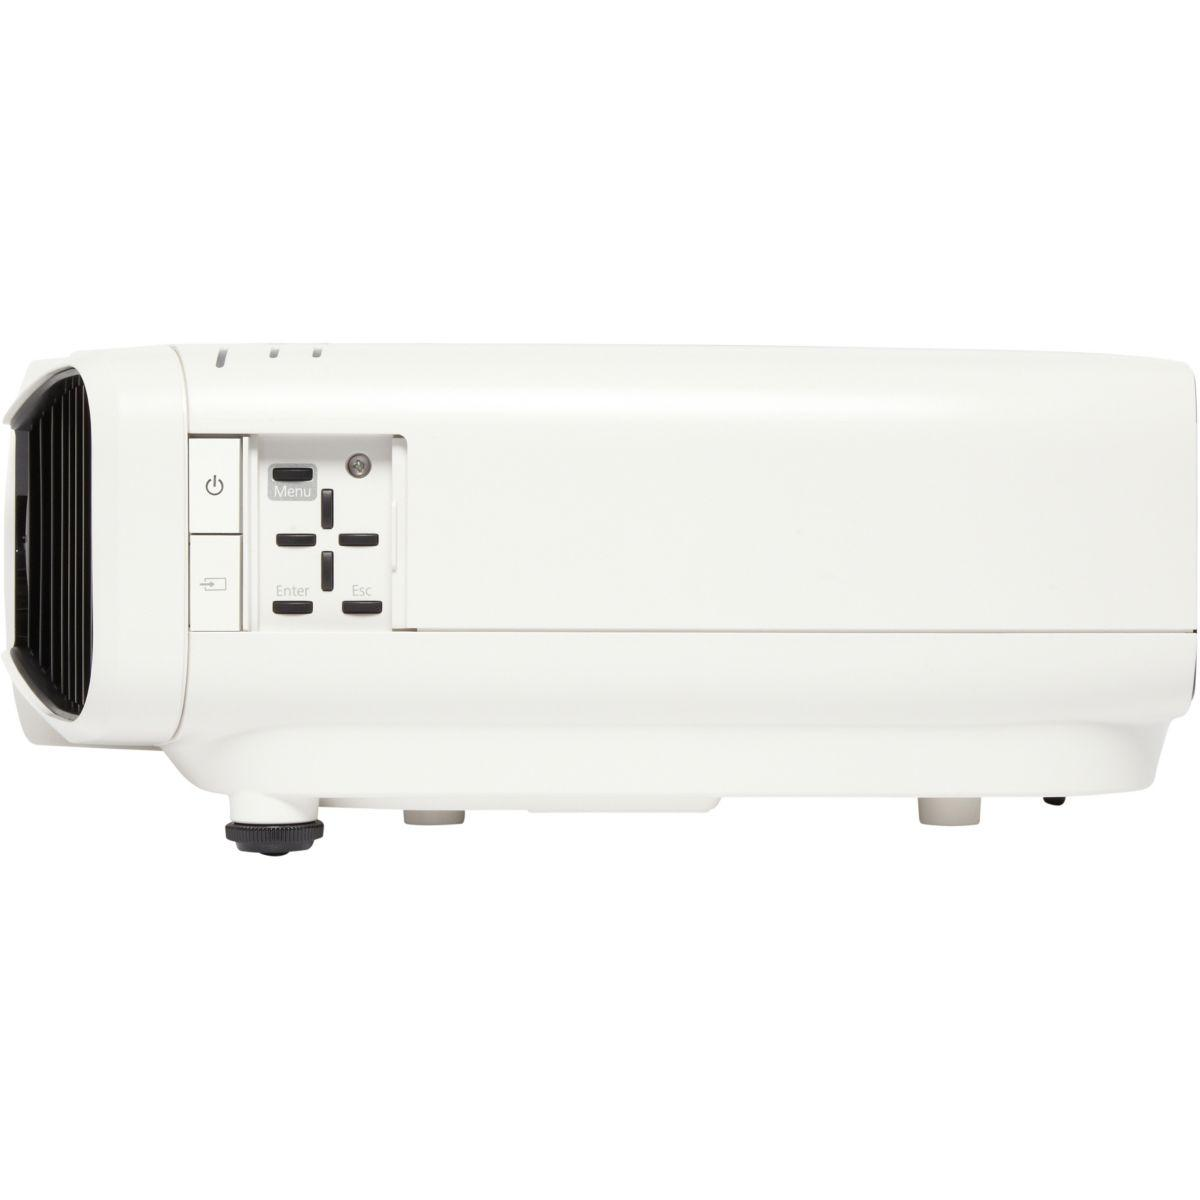 Epson EH-TW9200W Video projector 2400 Lumen - White